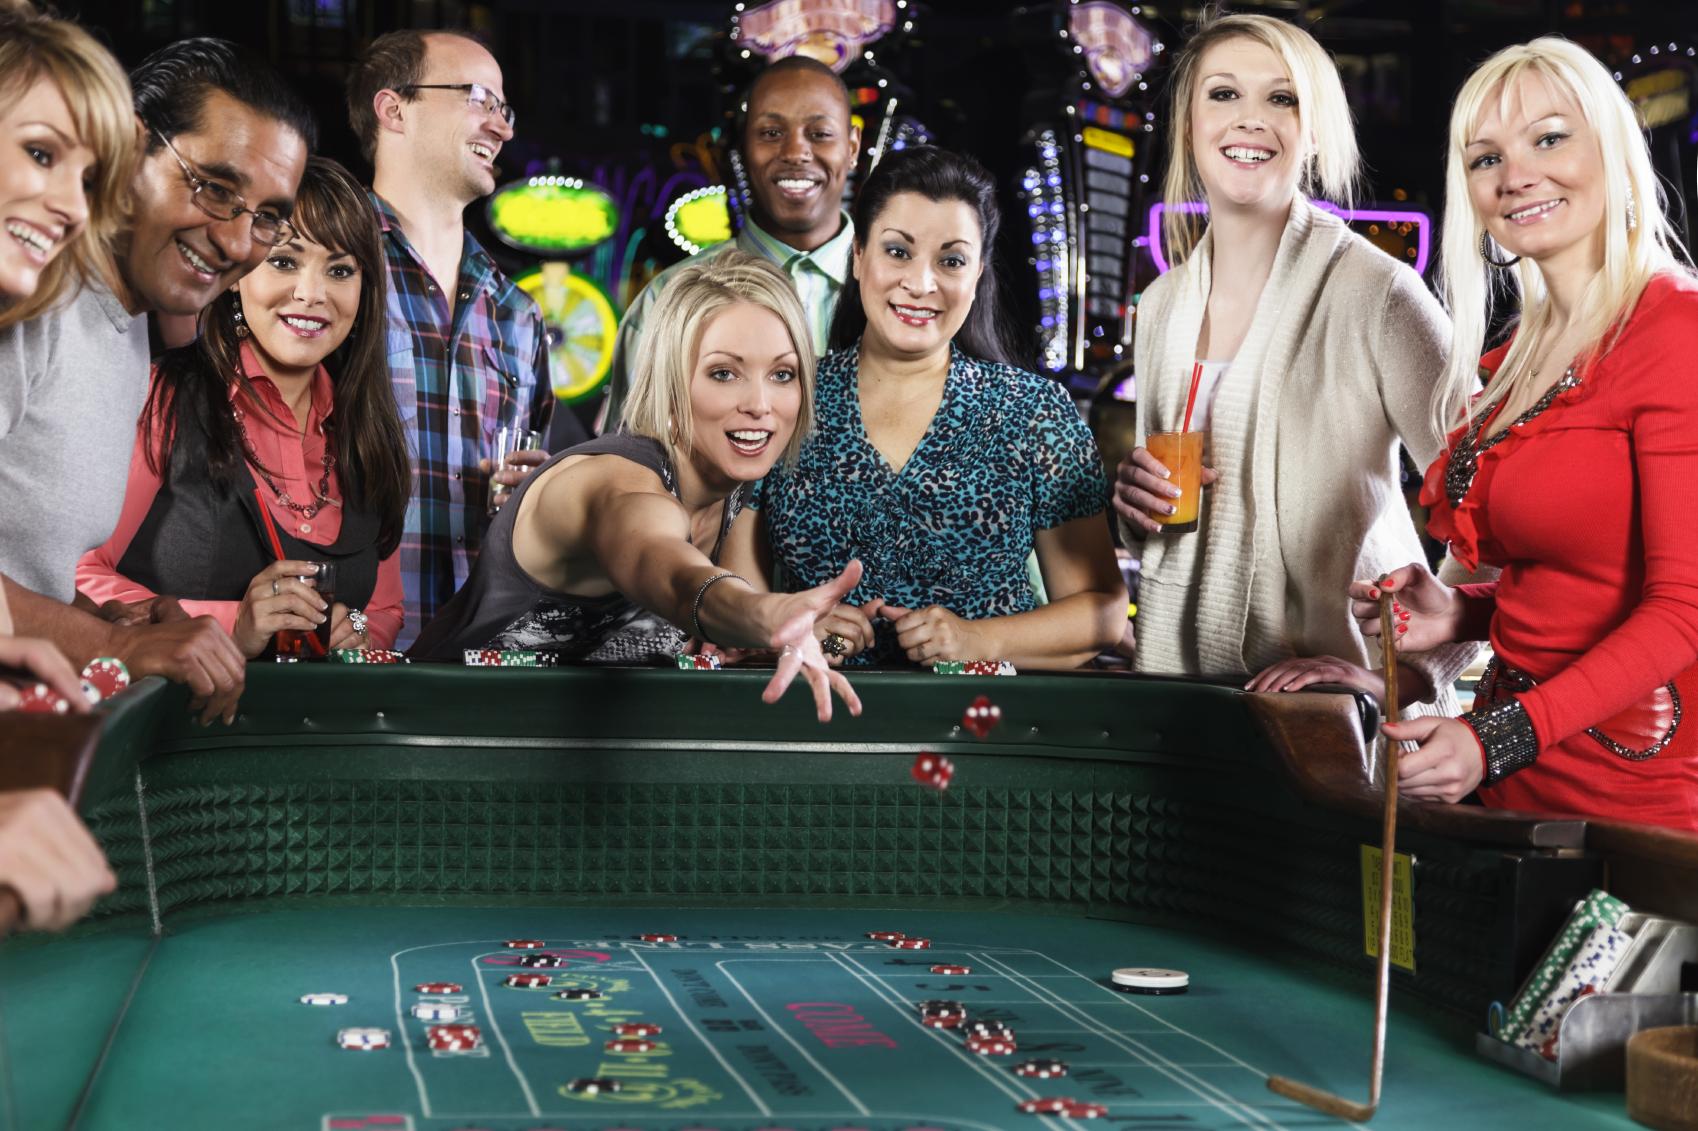 Casino monte carlo online confiable São Paulo 285515